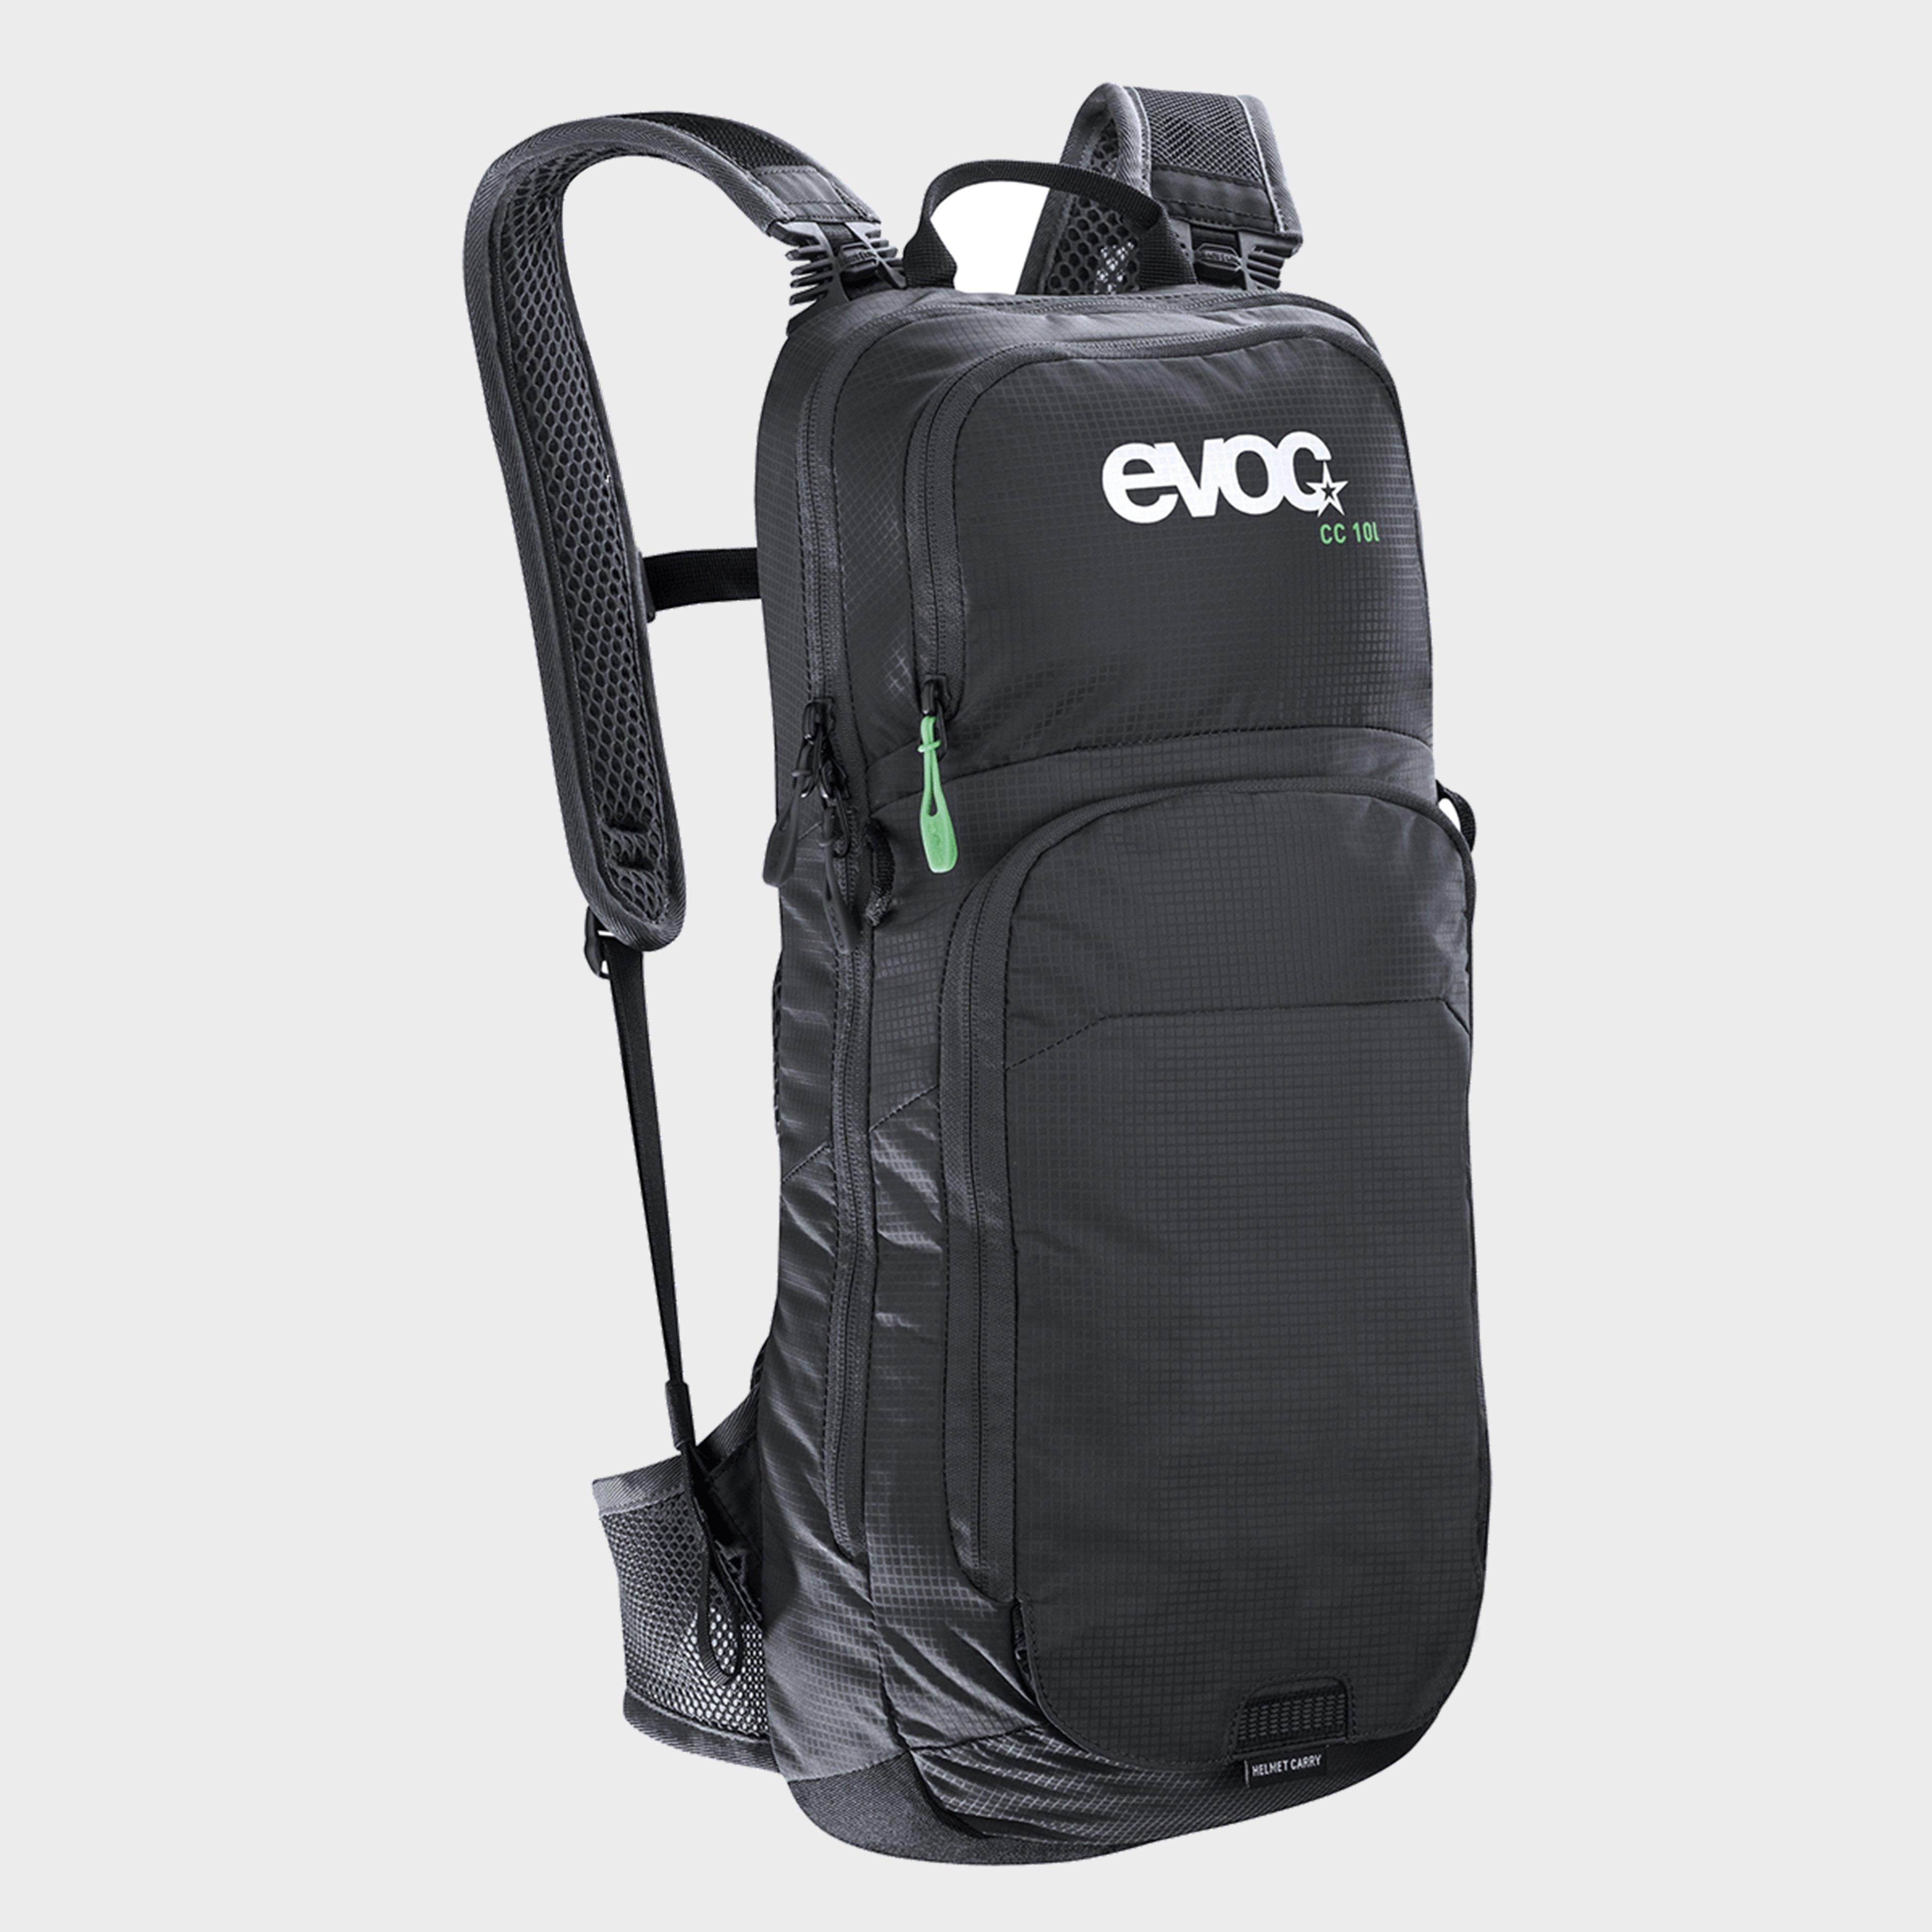 Evoc CC Hydration Daysack 10L & 2L Bladder, Black